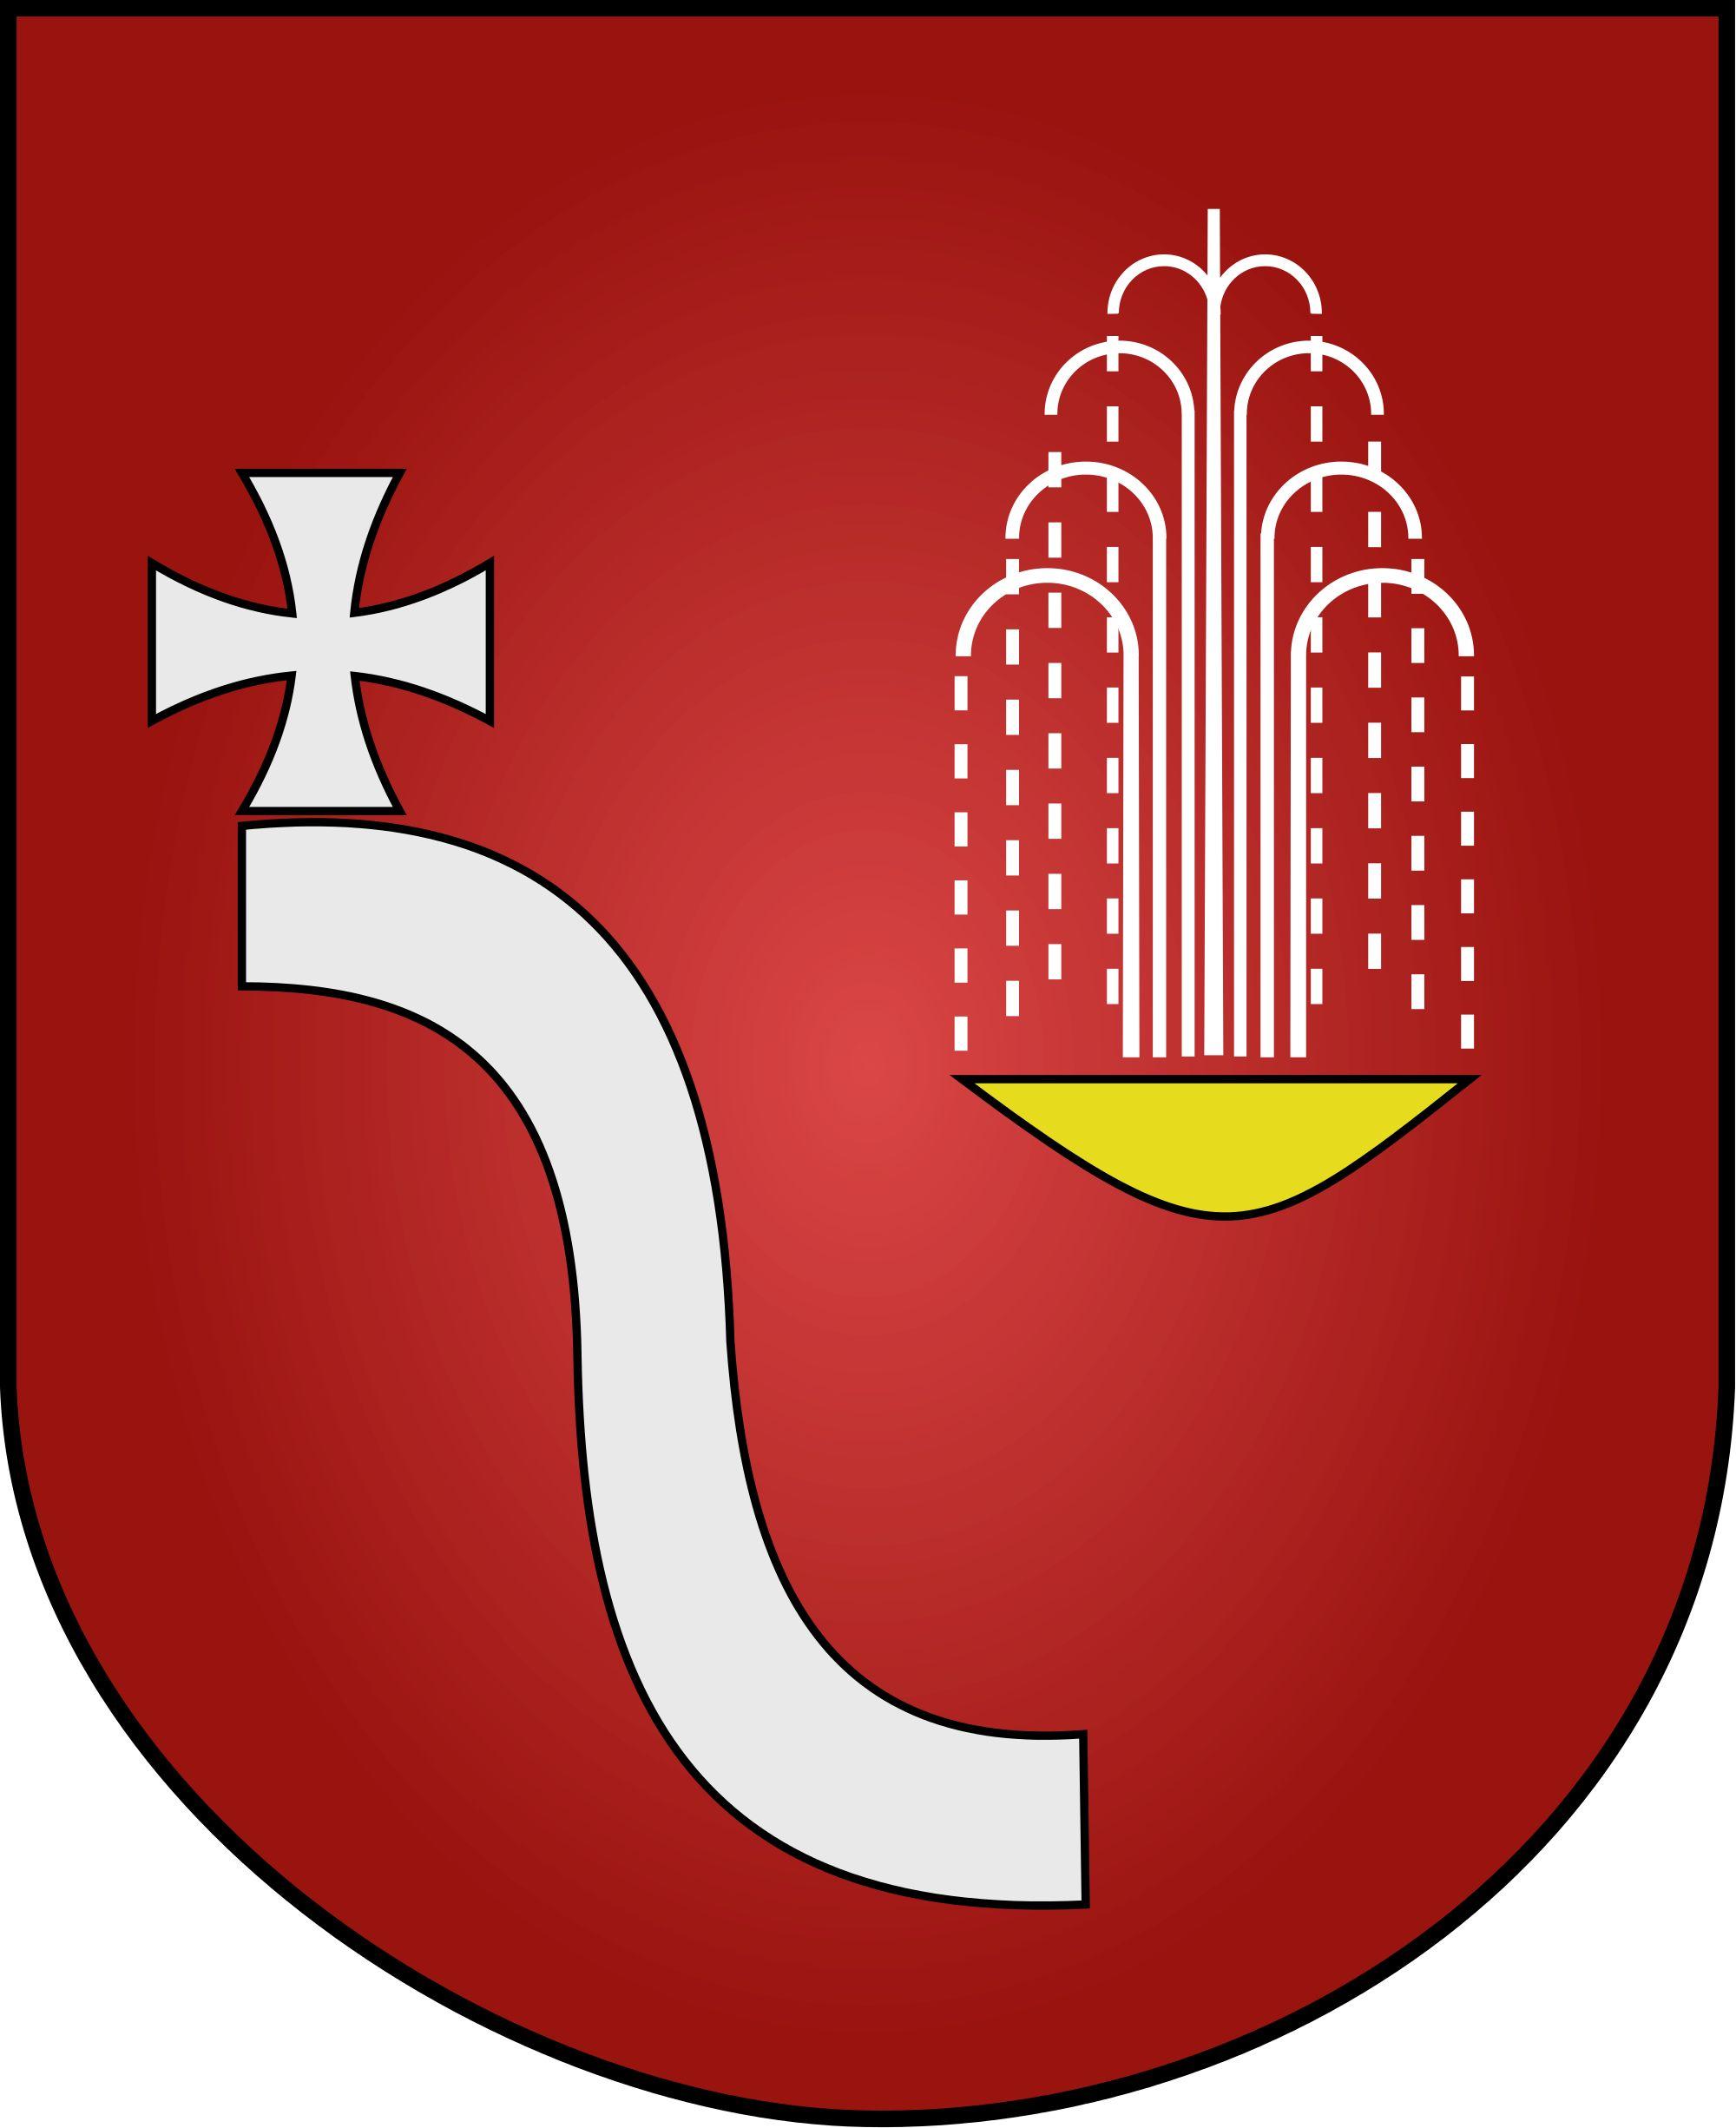 Horyniec-Zdrój